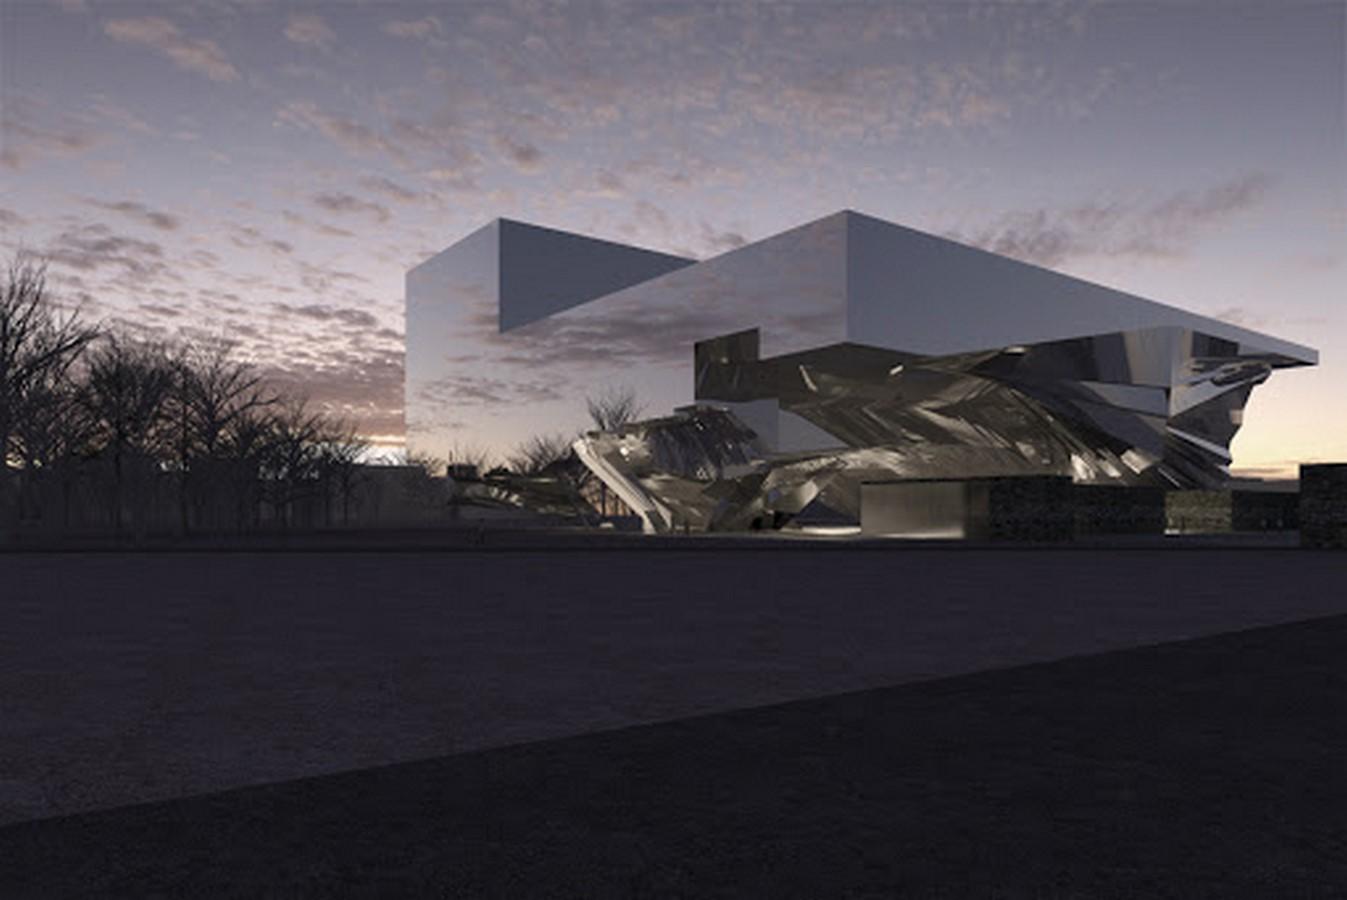 Museum of the Second World War International Competition, Gdansk, Poland - Sheet1